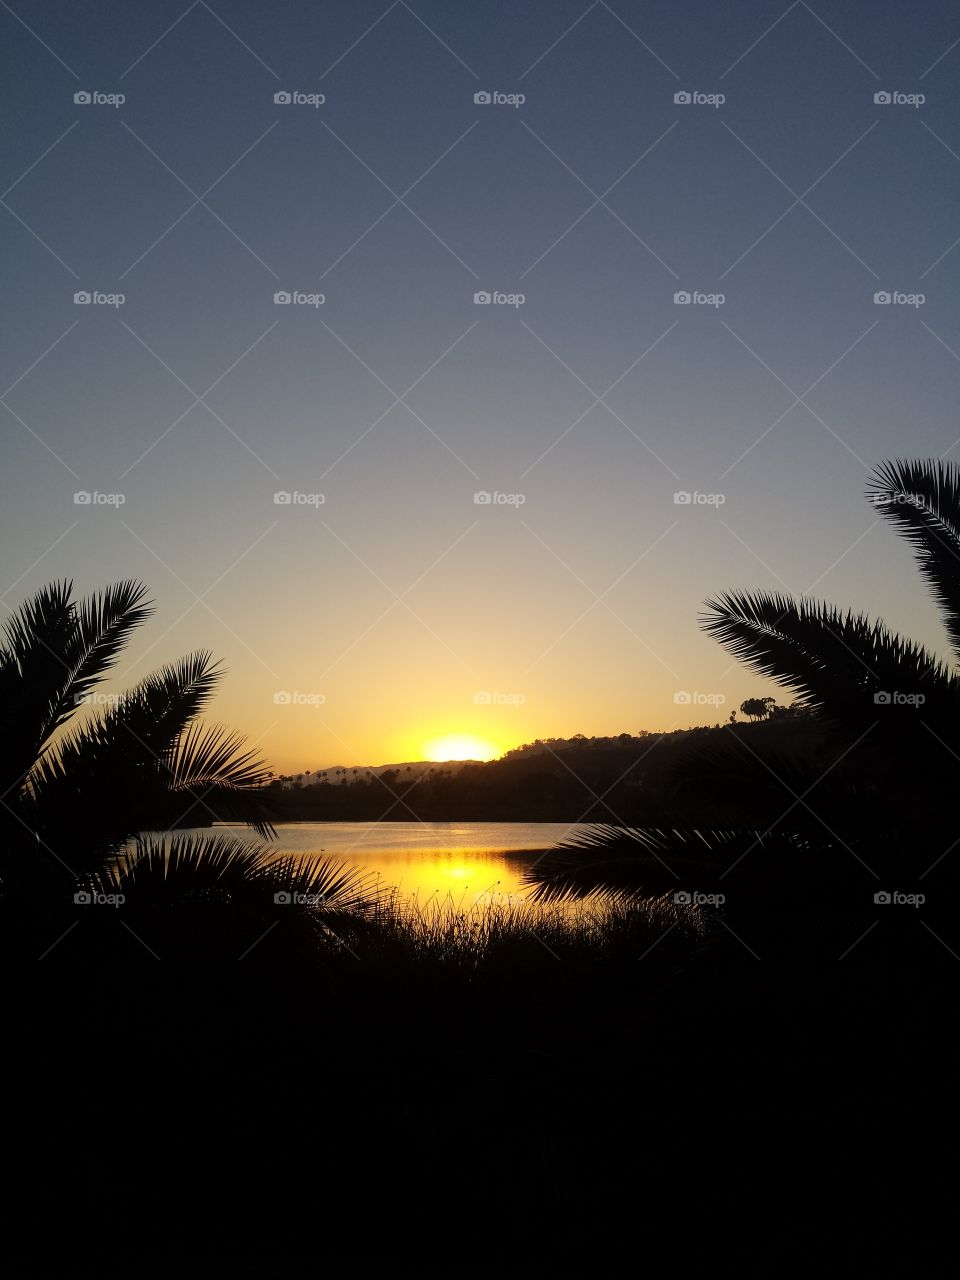 Santa Barbara and the setting sun